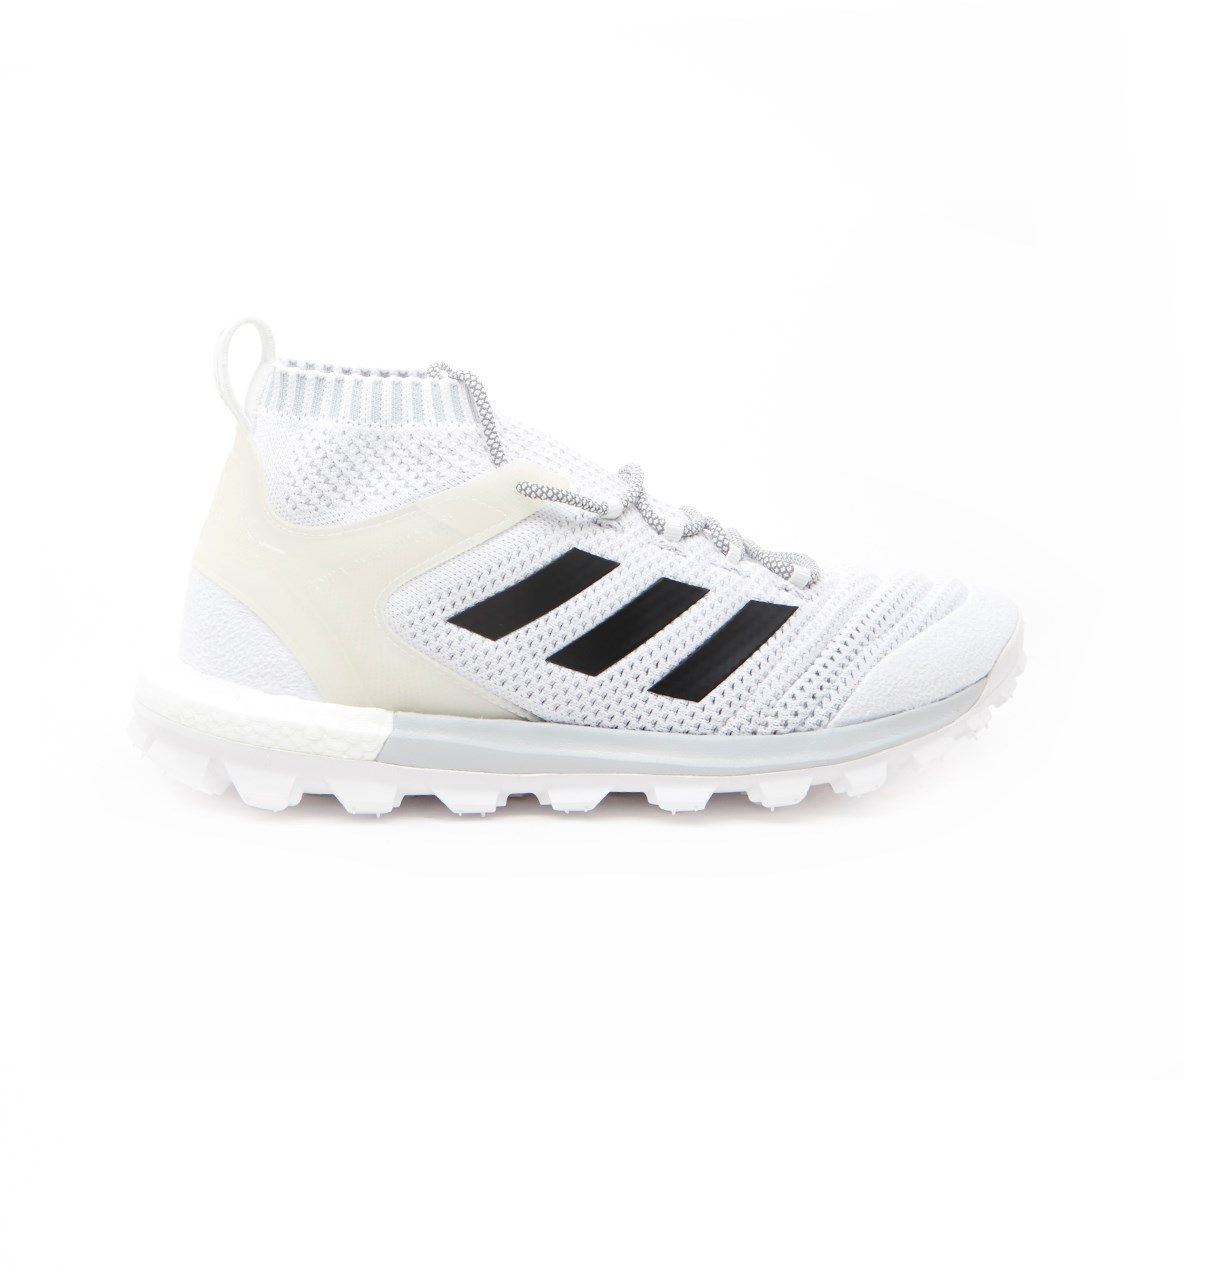 buy popular 84e8c 4f2cb GOSHA RUBCHINSKIY Gosha Rubchinskiy X Adidas网眼运动鞋 ...